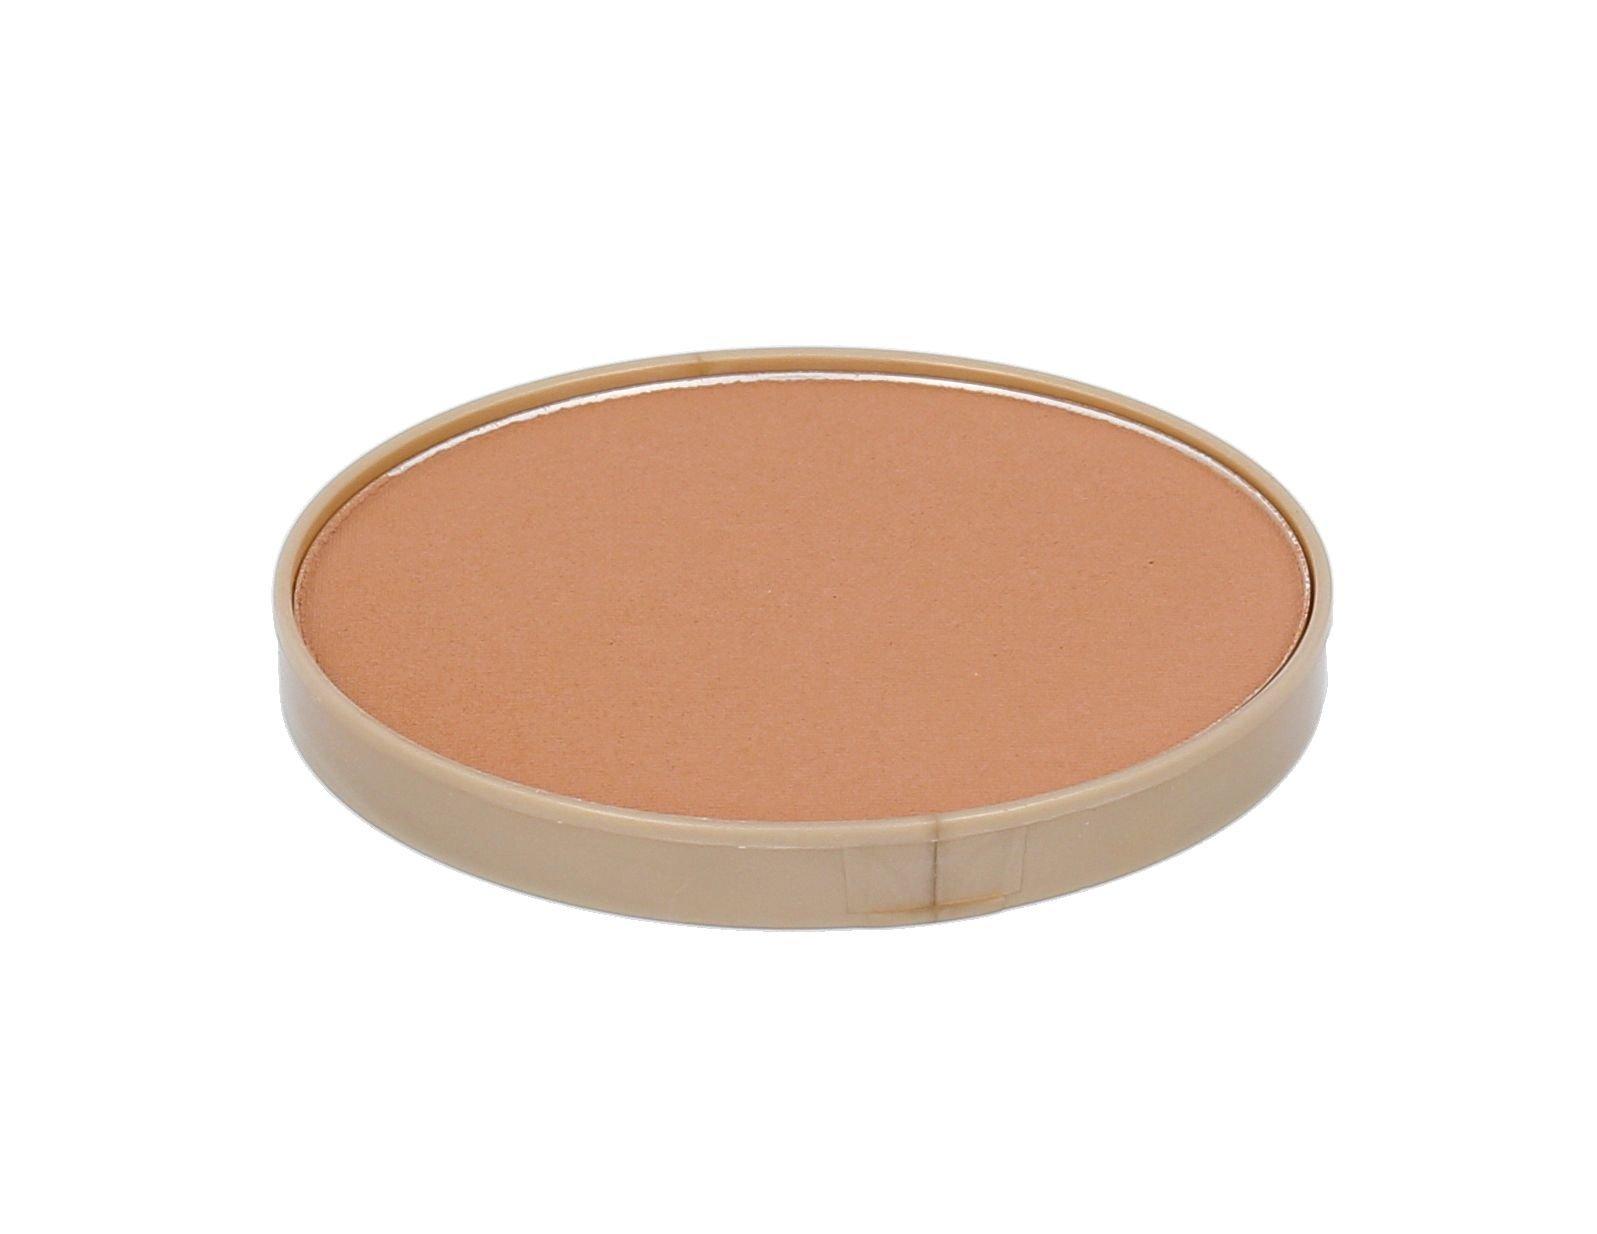 Artdeco Pure Minerals Cosmetic 9ml 25 Sun Beige